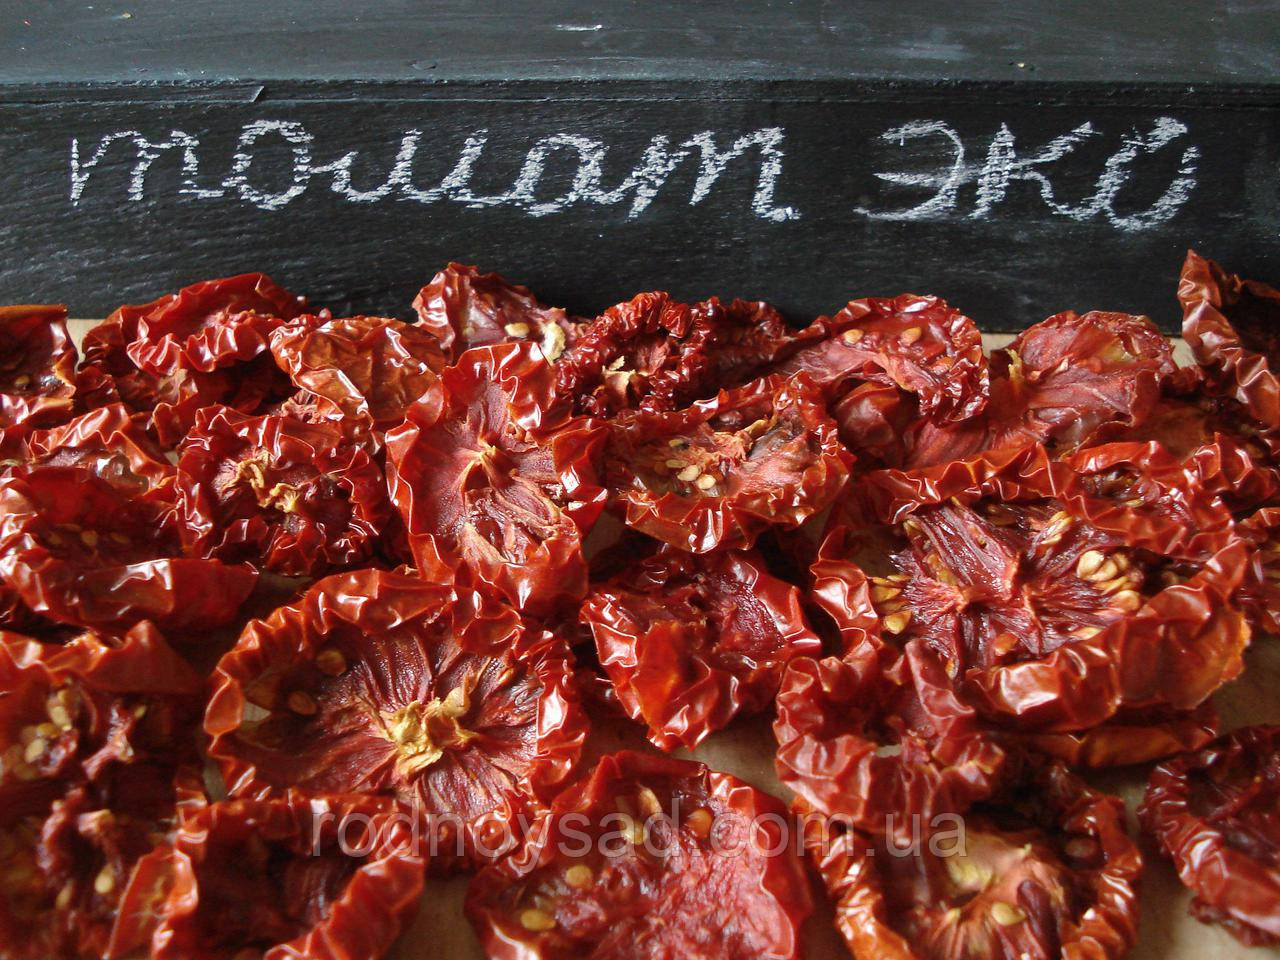 Помидор (томат) сушеный домашний (50 грамм)